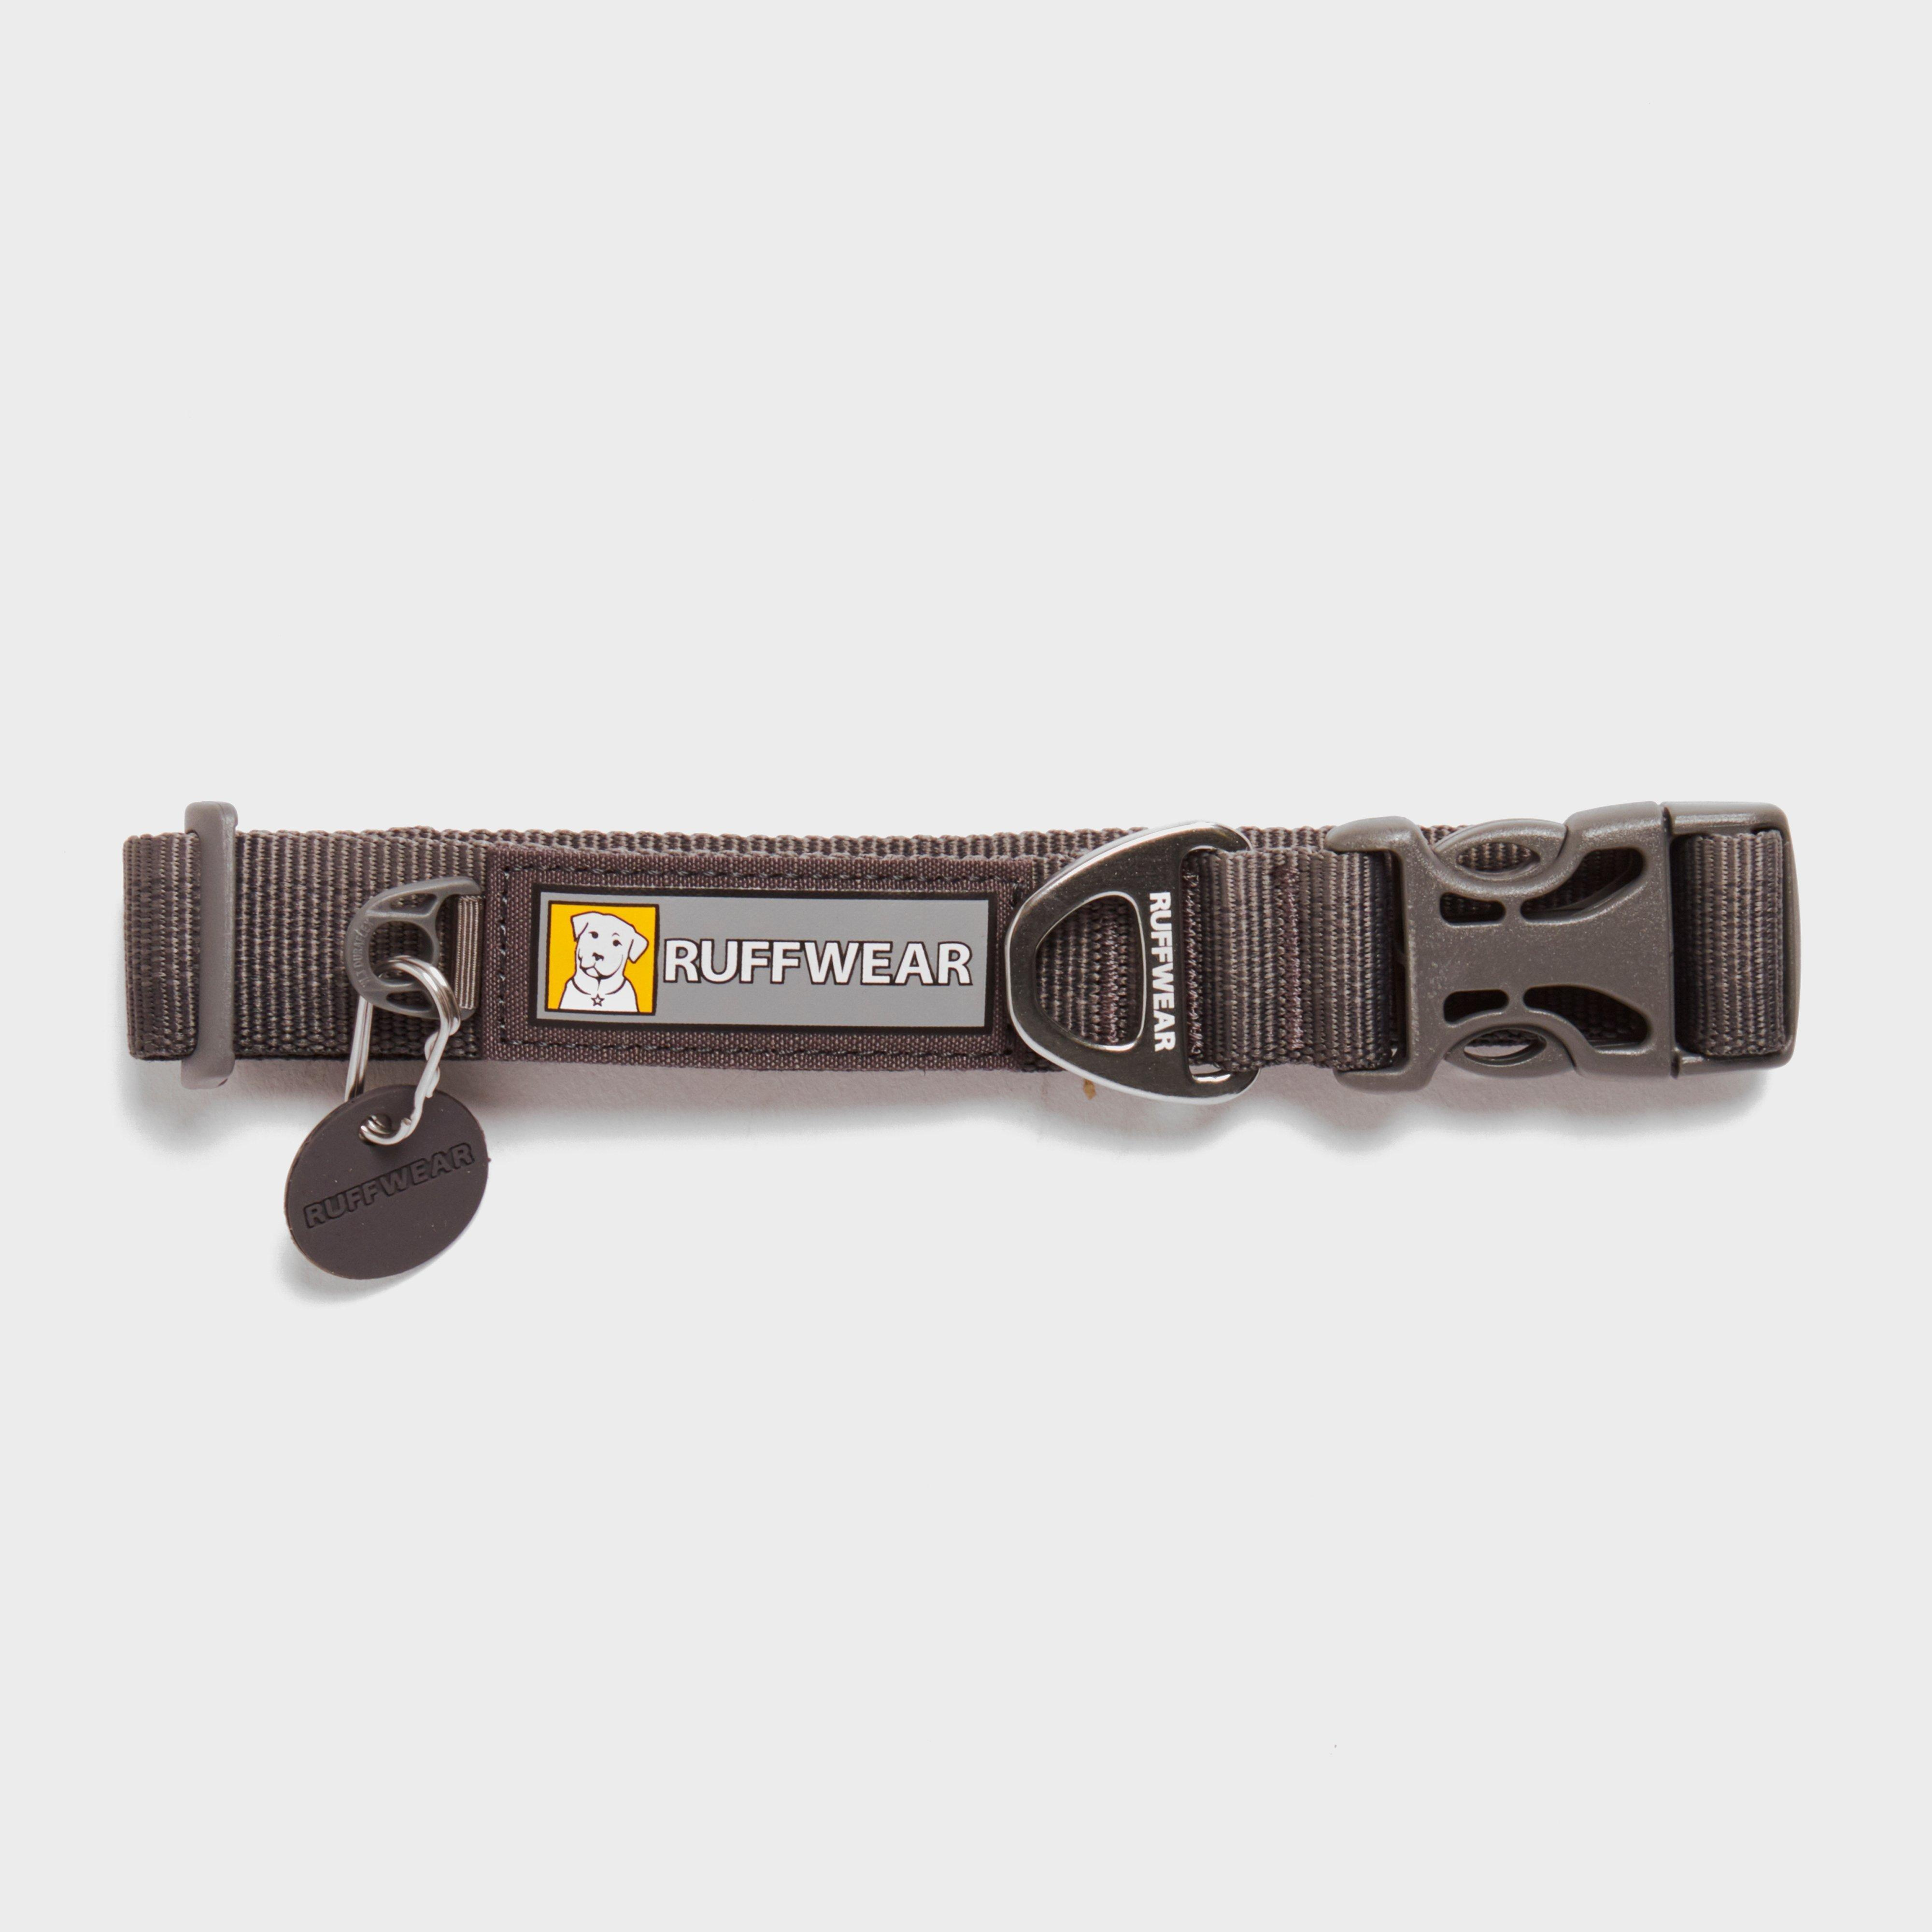 Image of Ruffwear Front Range Dog Collar - Grey/Dgy, Grey/DGY